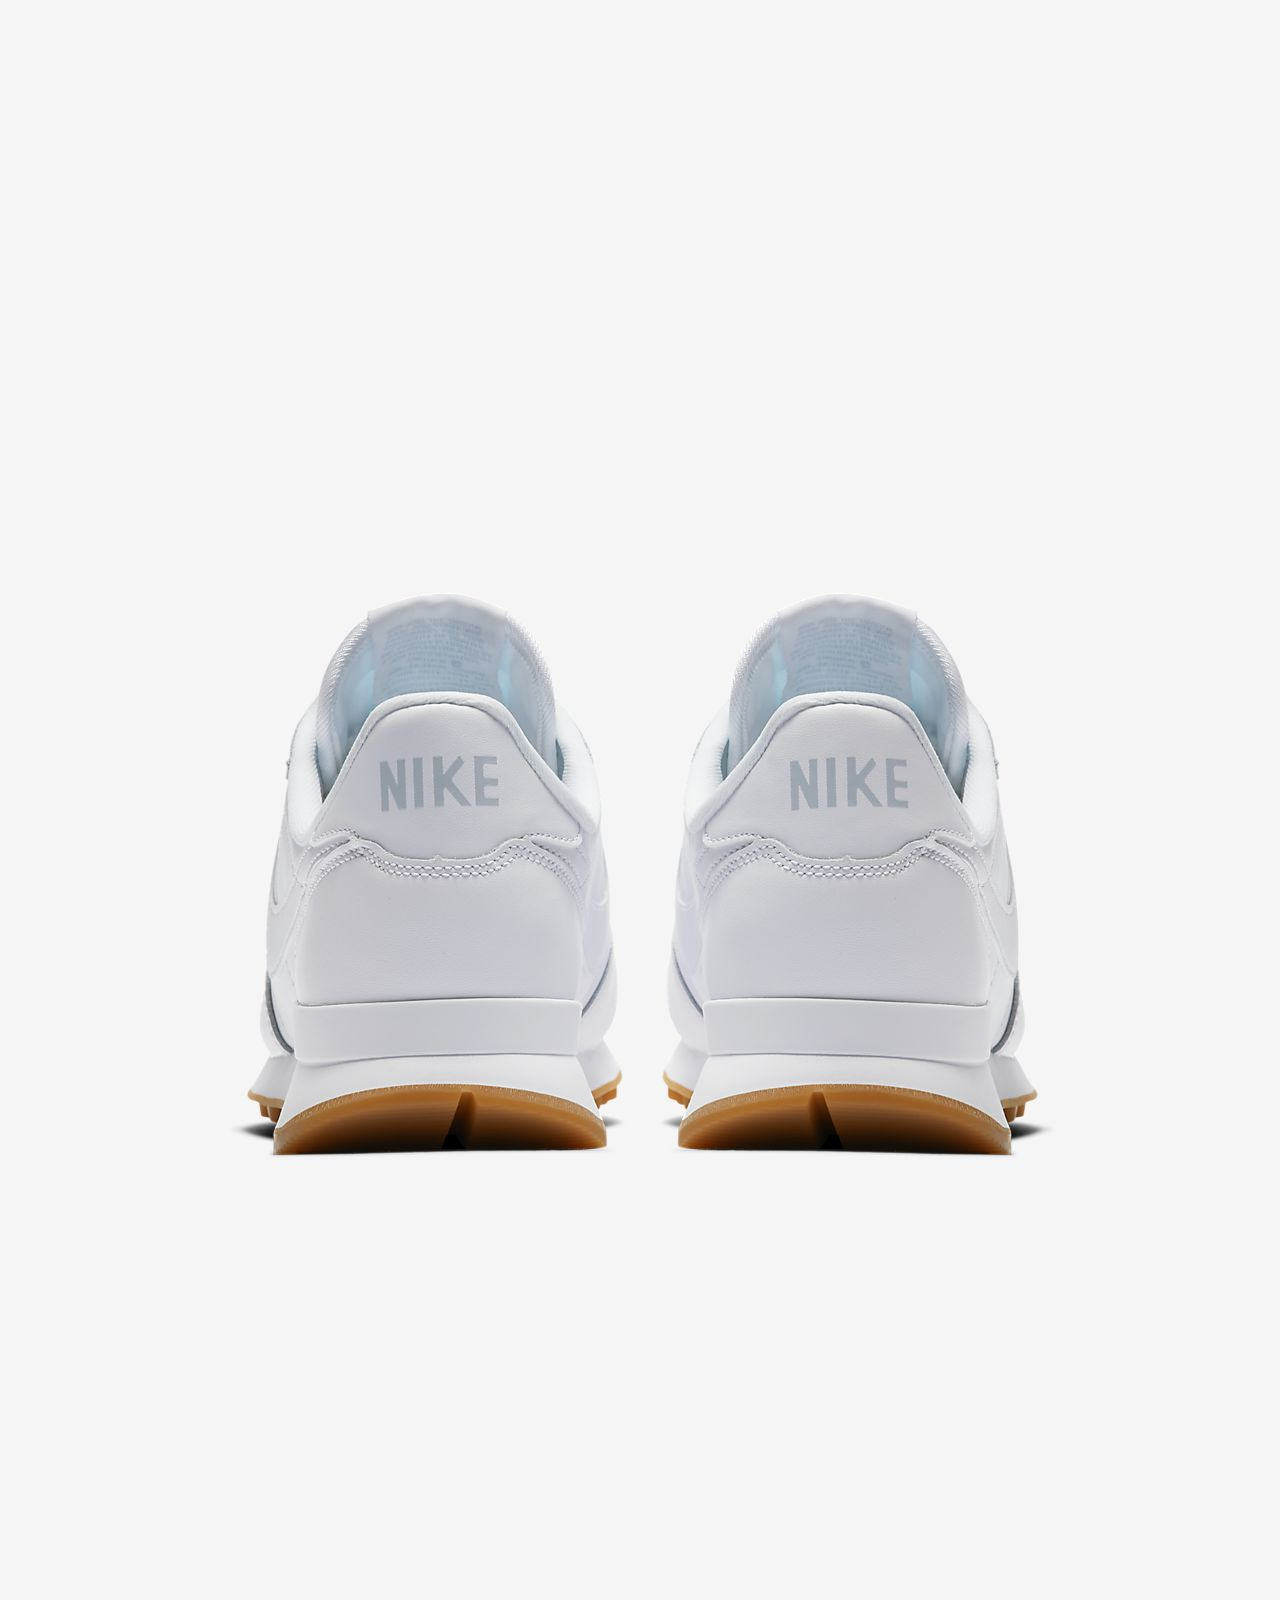 2016 Mode RYT Schuhe Max Sneaker Herren Damen Kinder Sport